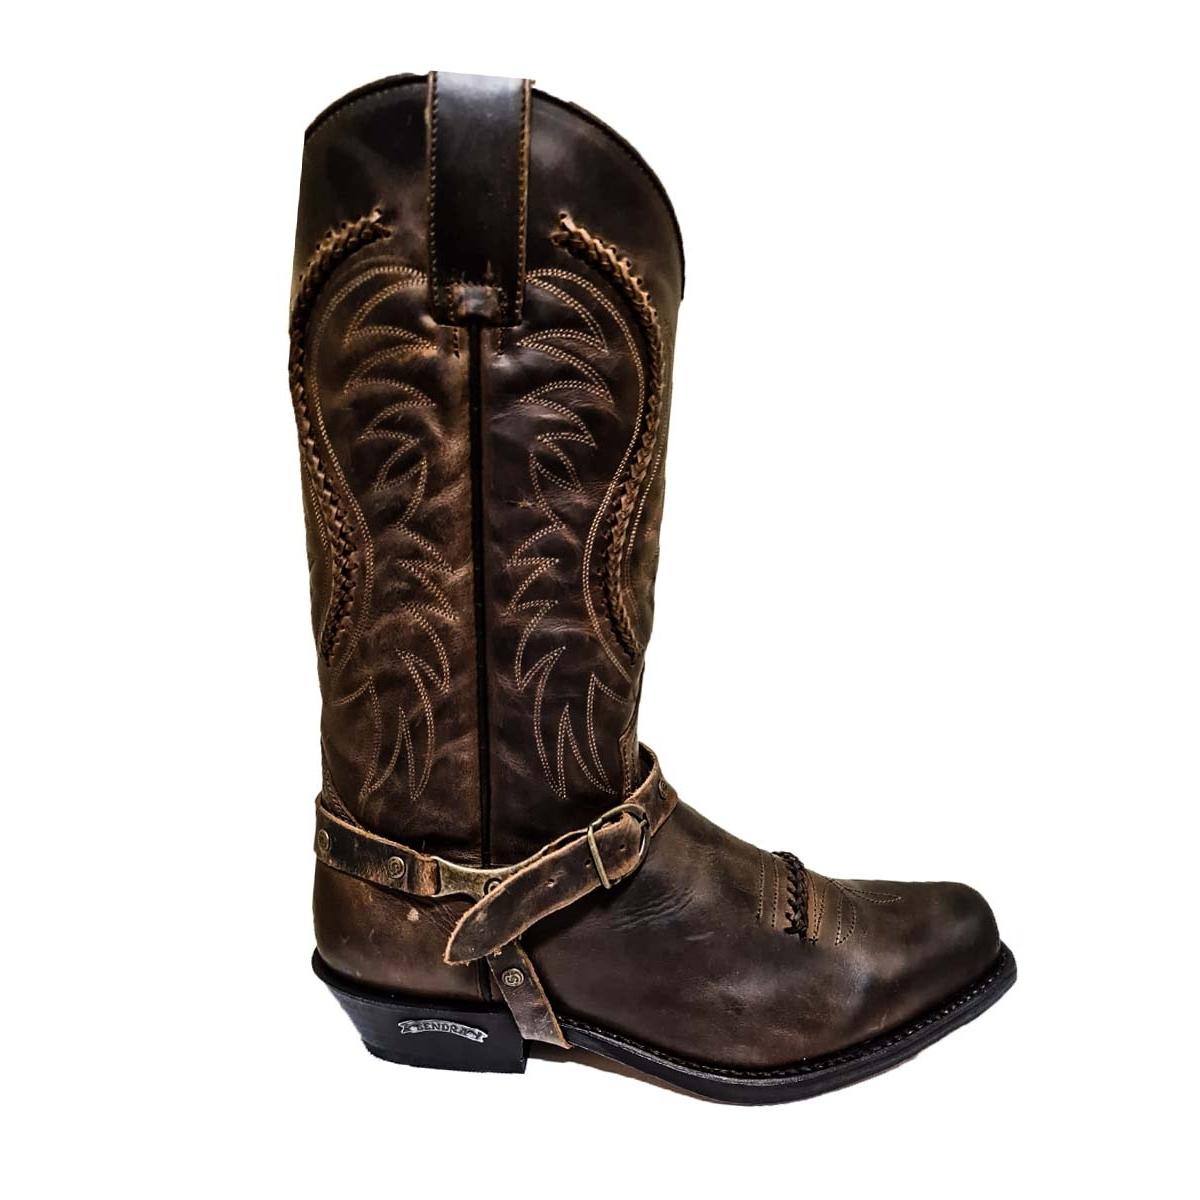 Cizme Cowboy Unisex 3434 Seta Mad Dog Tang